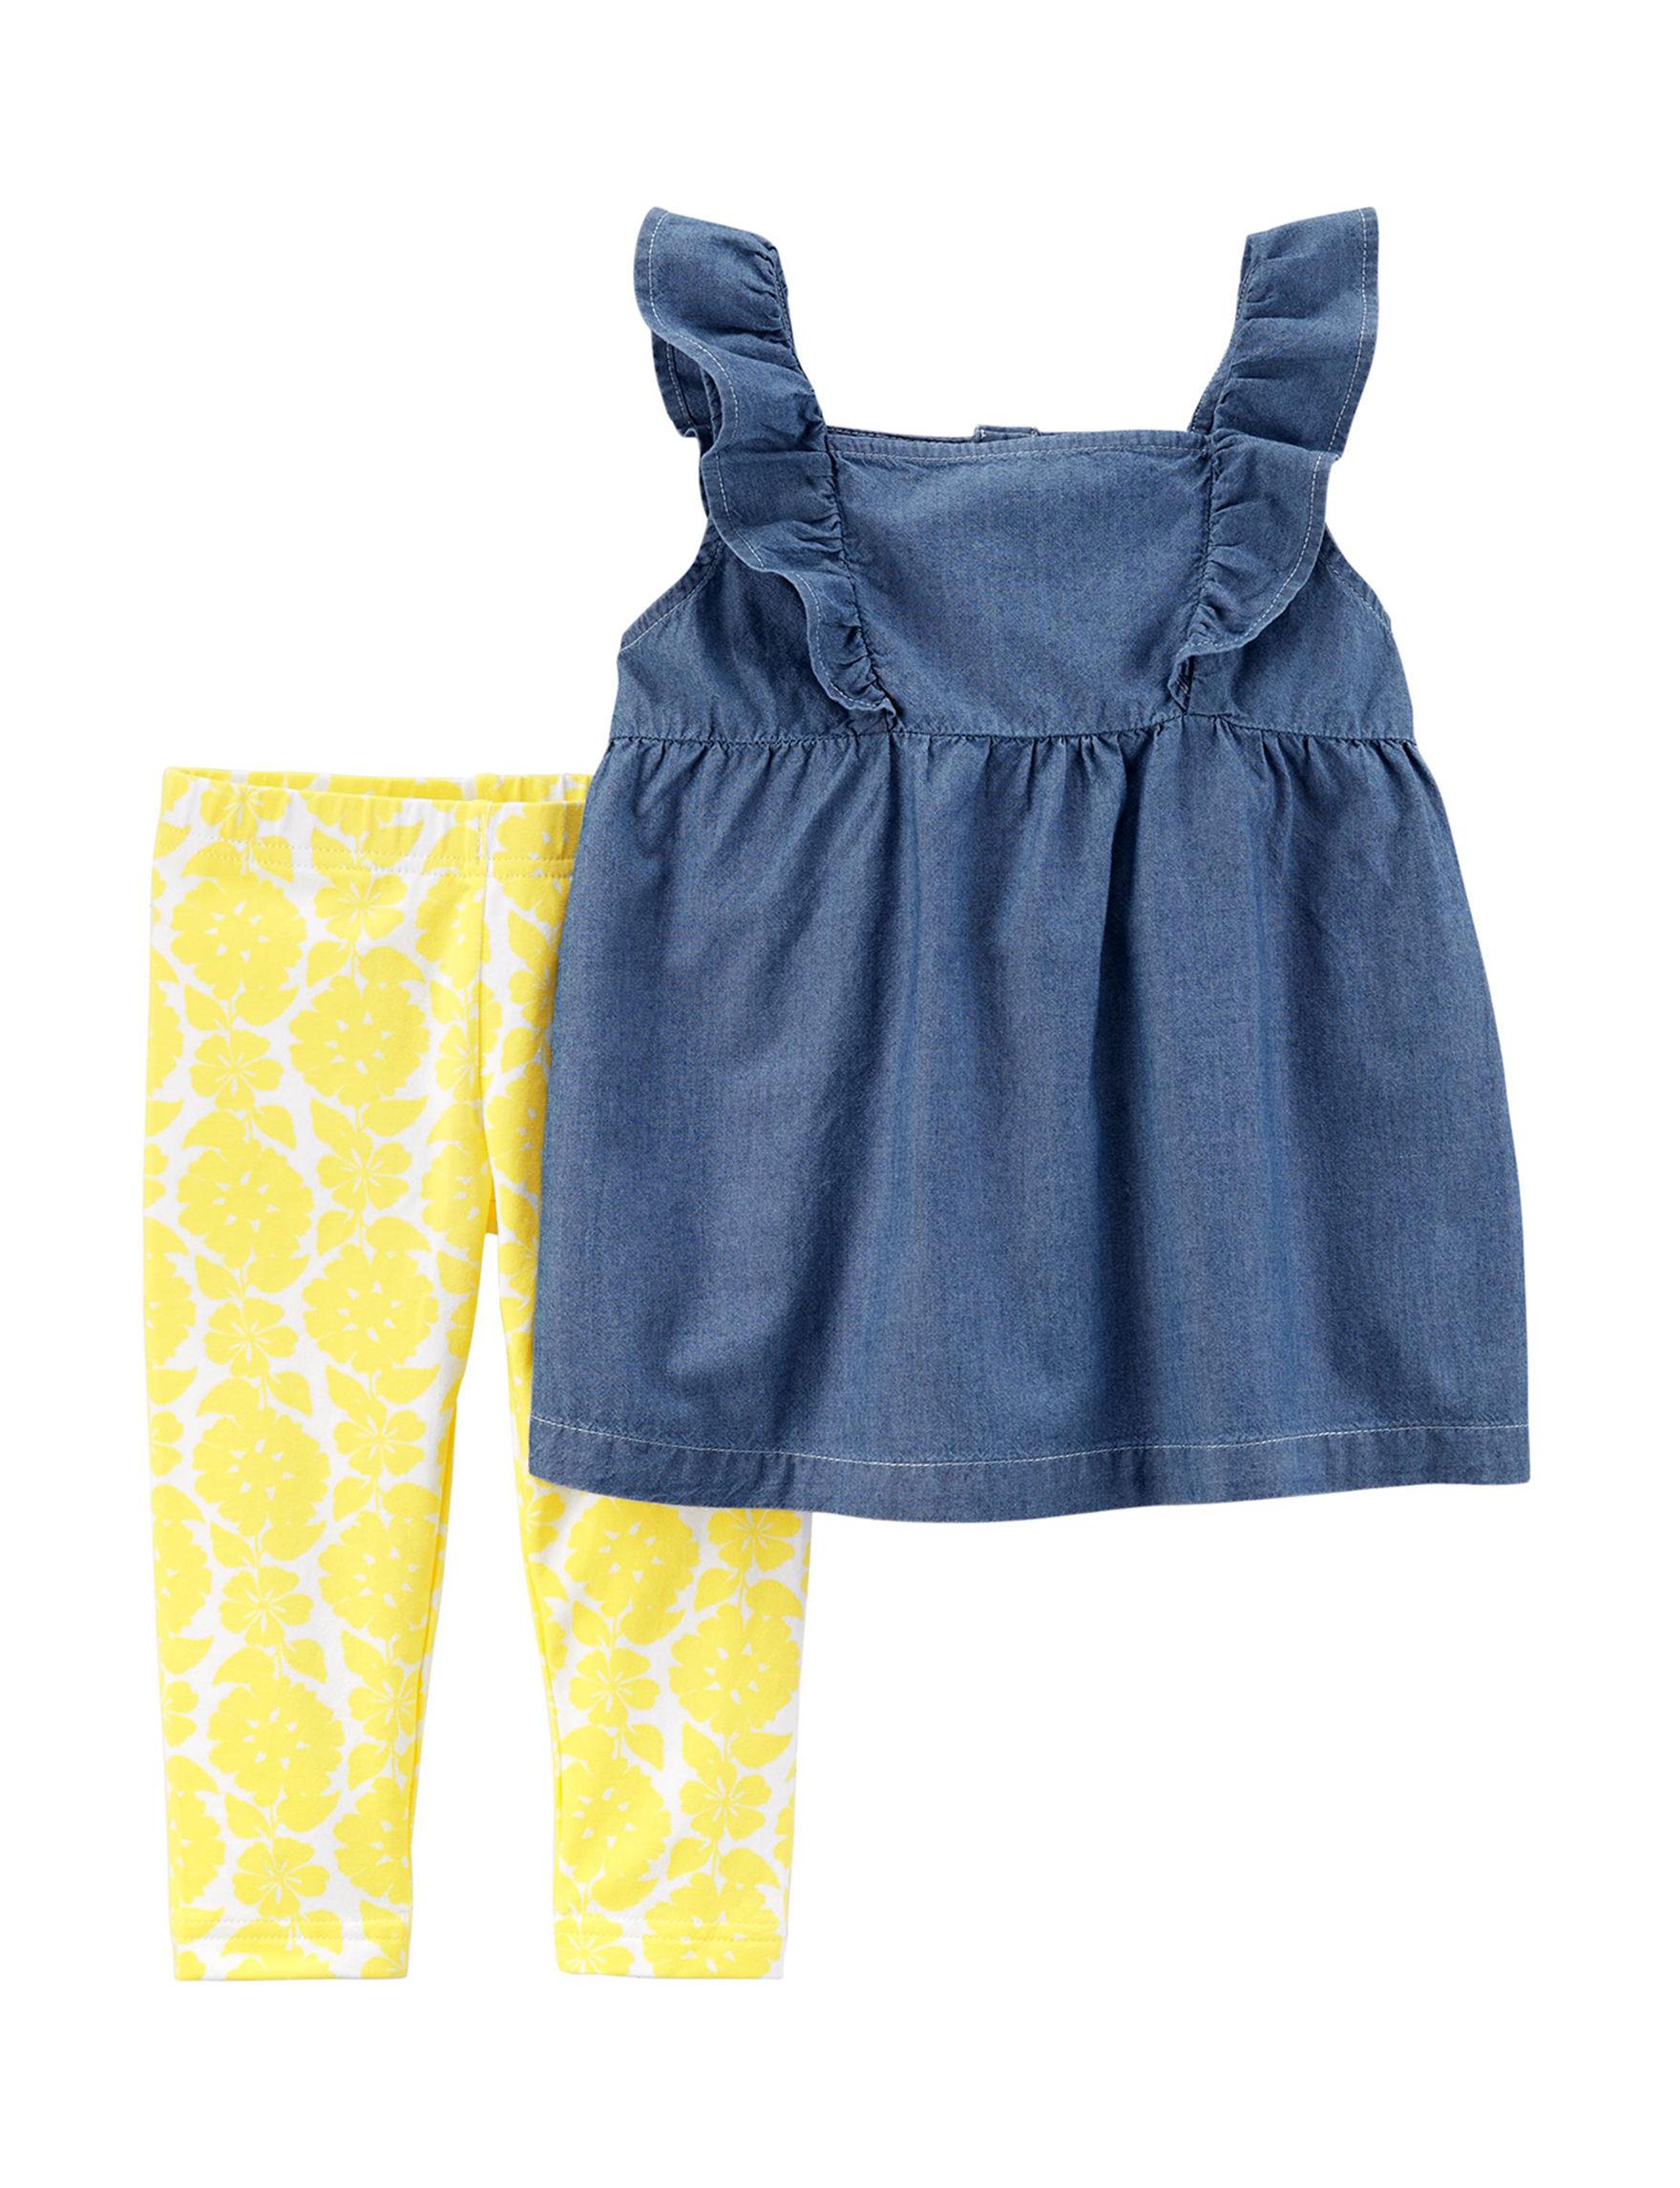 Carter's Blue / Yellow